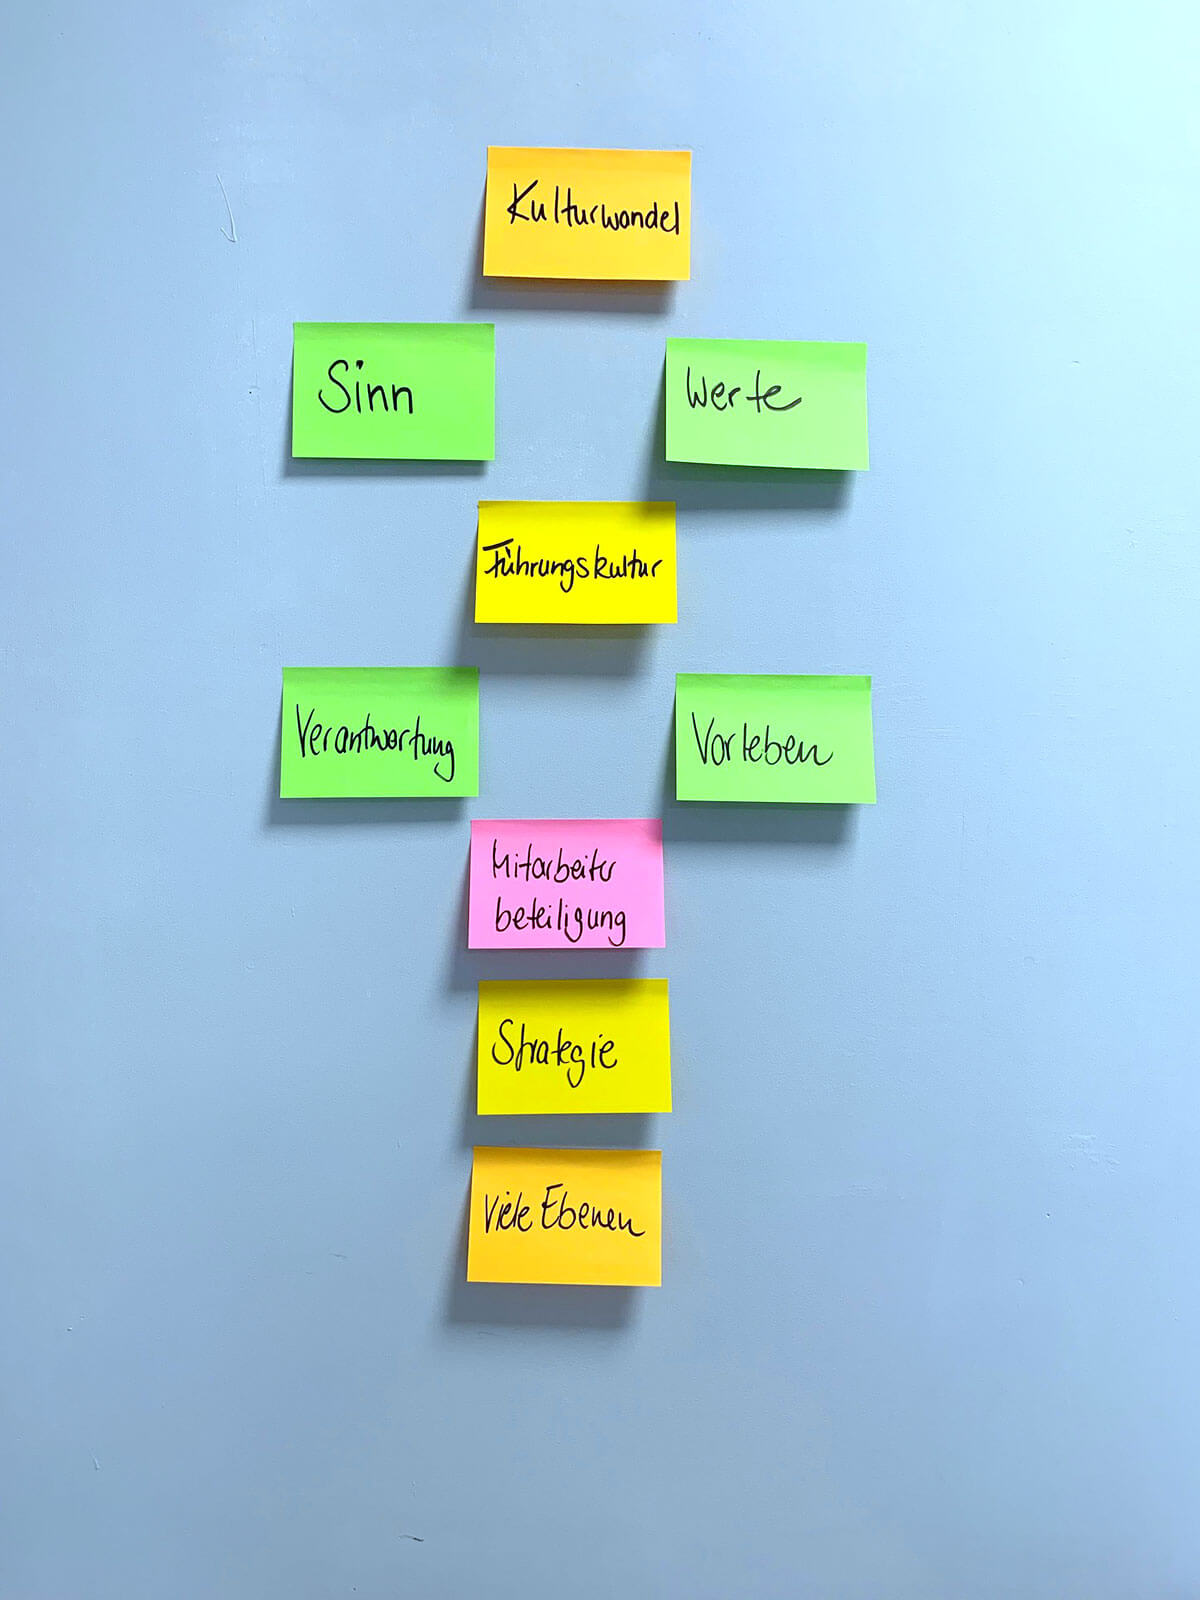 Kulturwandel in Organisationen – I.C.H. Beratung